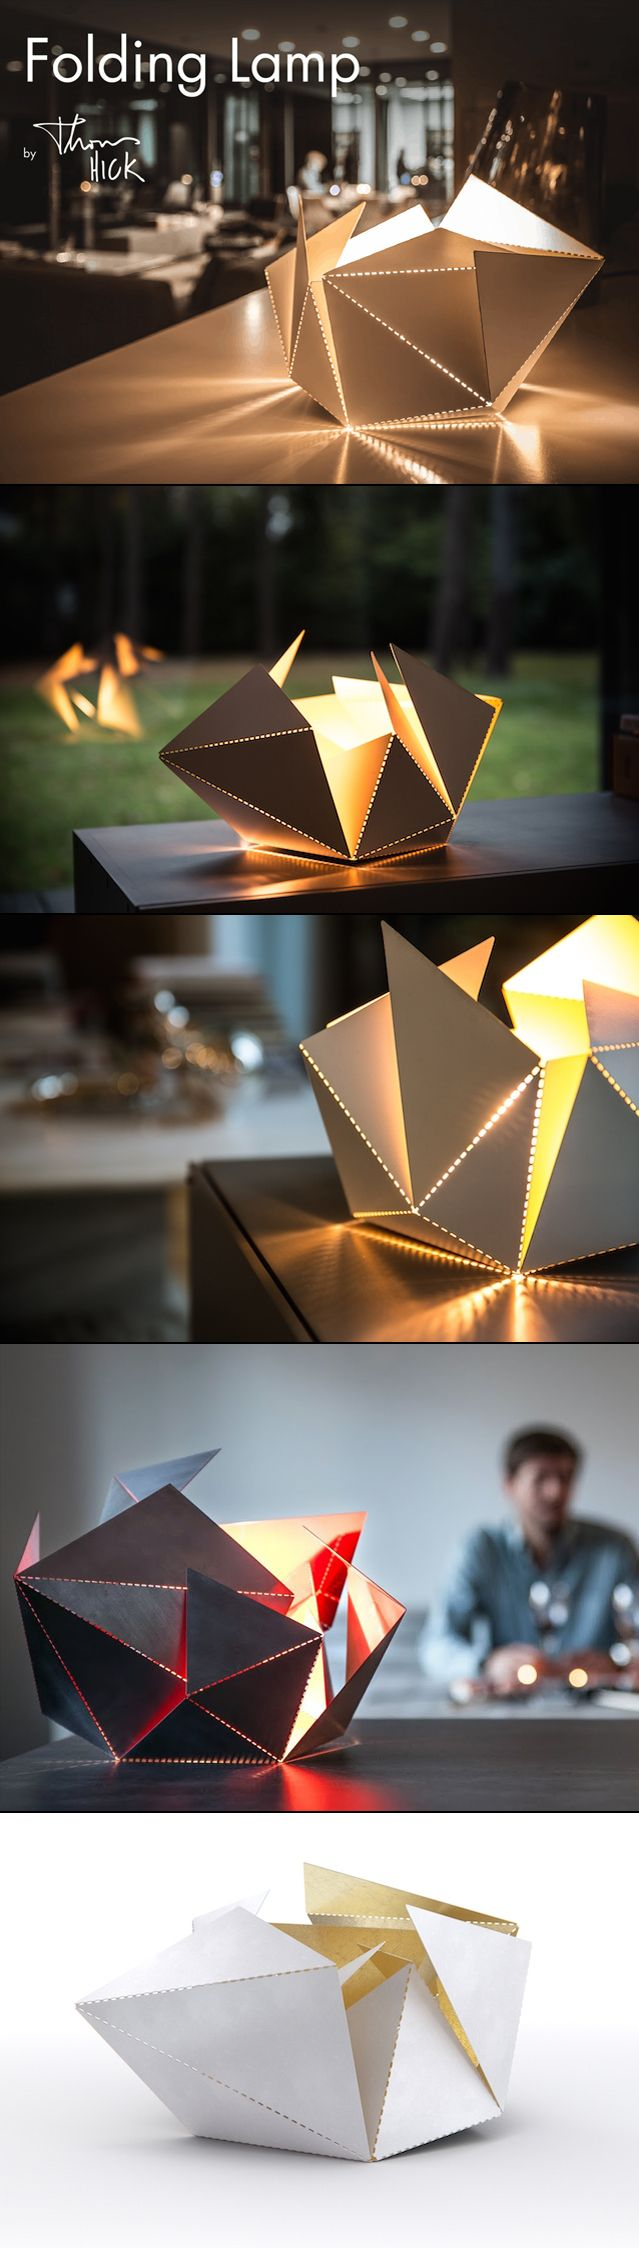 Folding Lamp by Thomas Hick